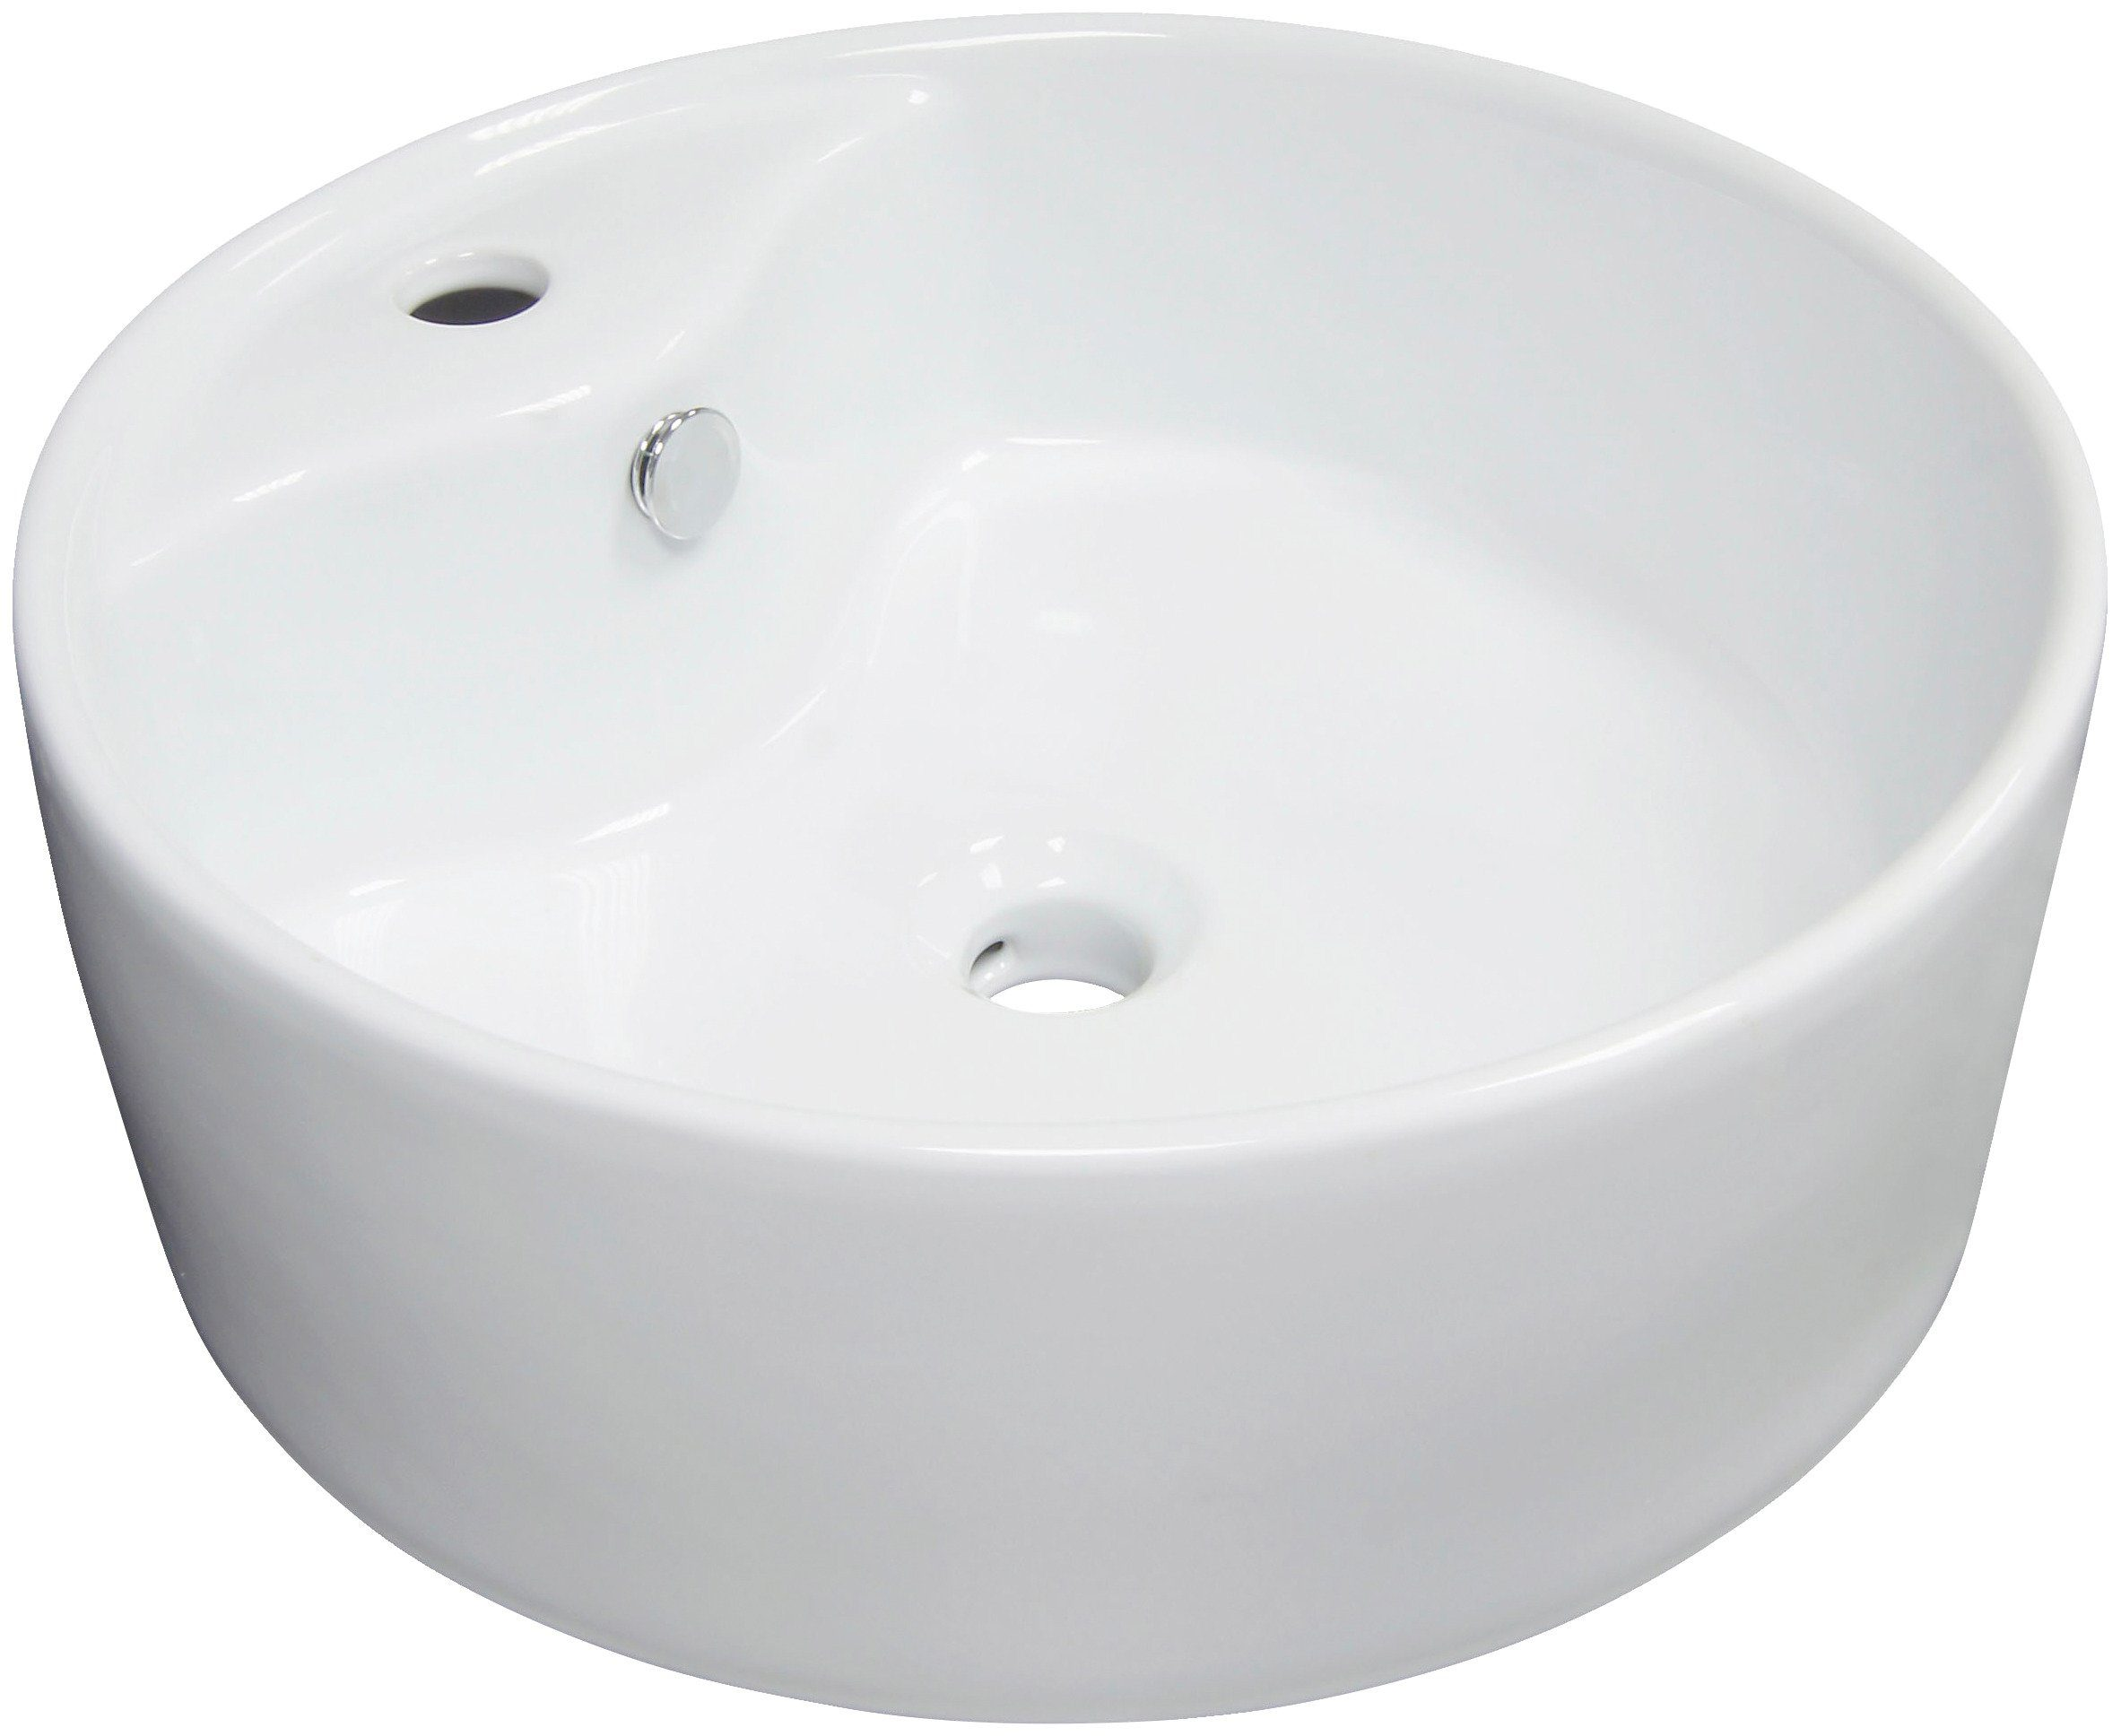 Badkamer Wasbak Verstopt : Badkamer wasbak afvoer keuken wasbak home design ideas